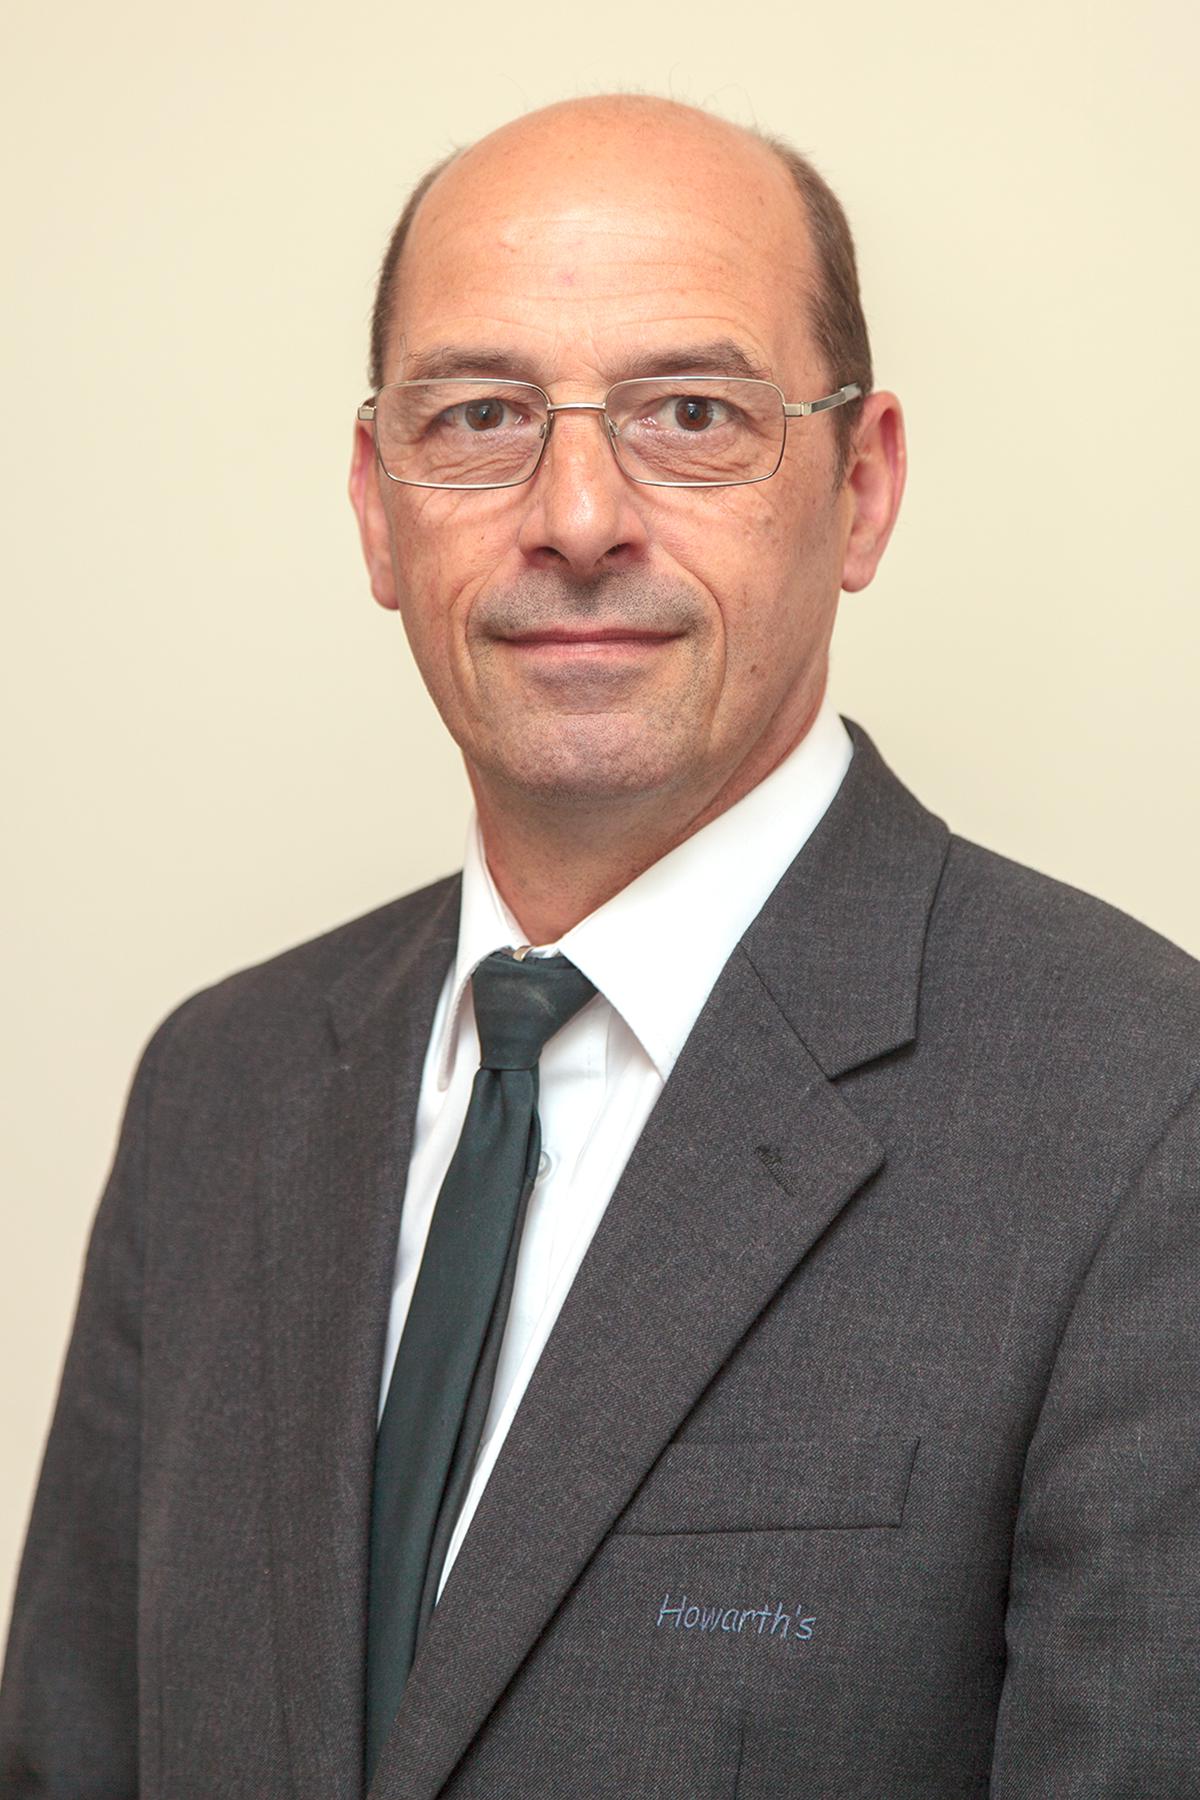 Philip Waring